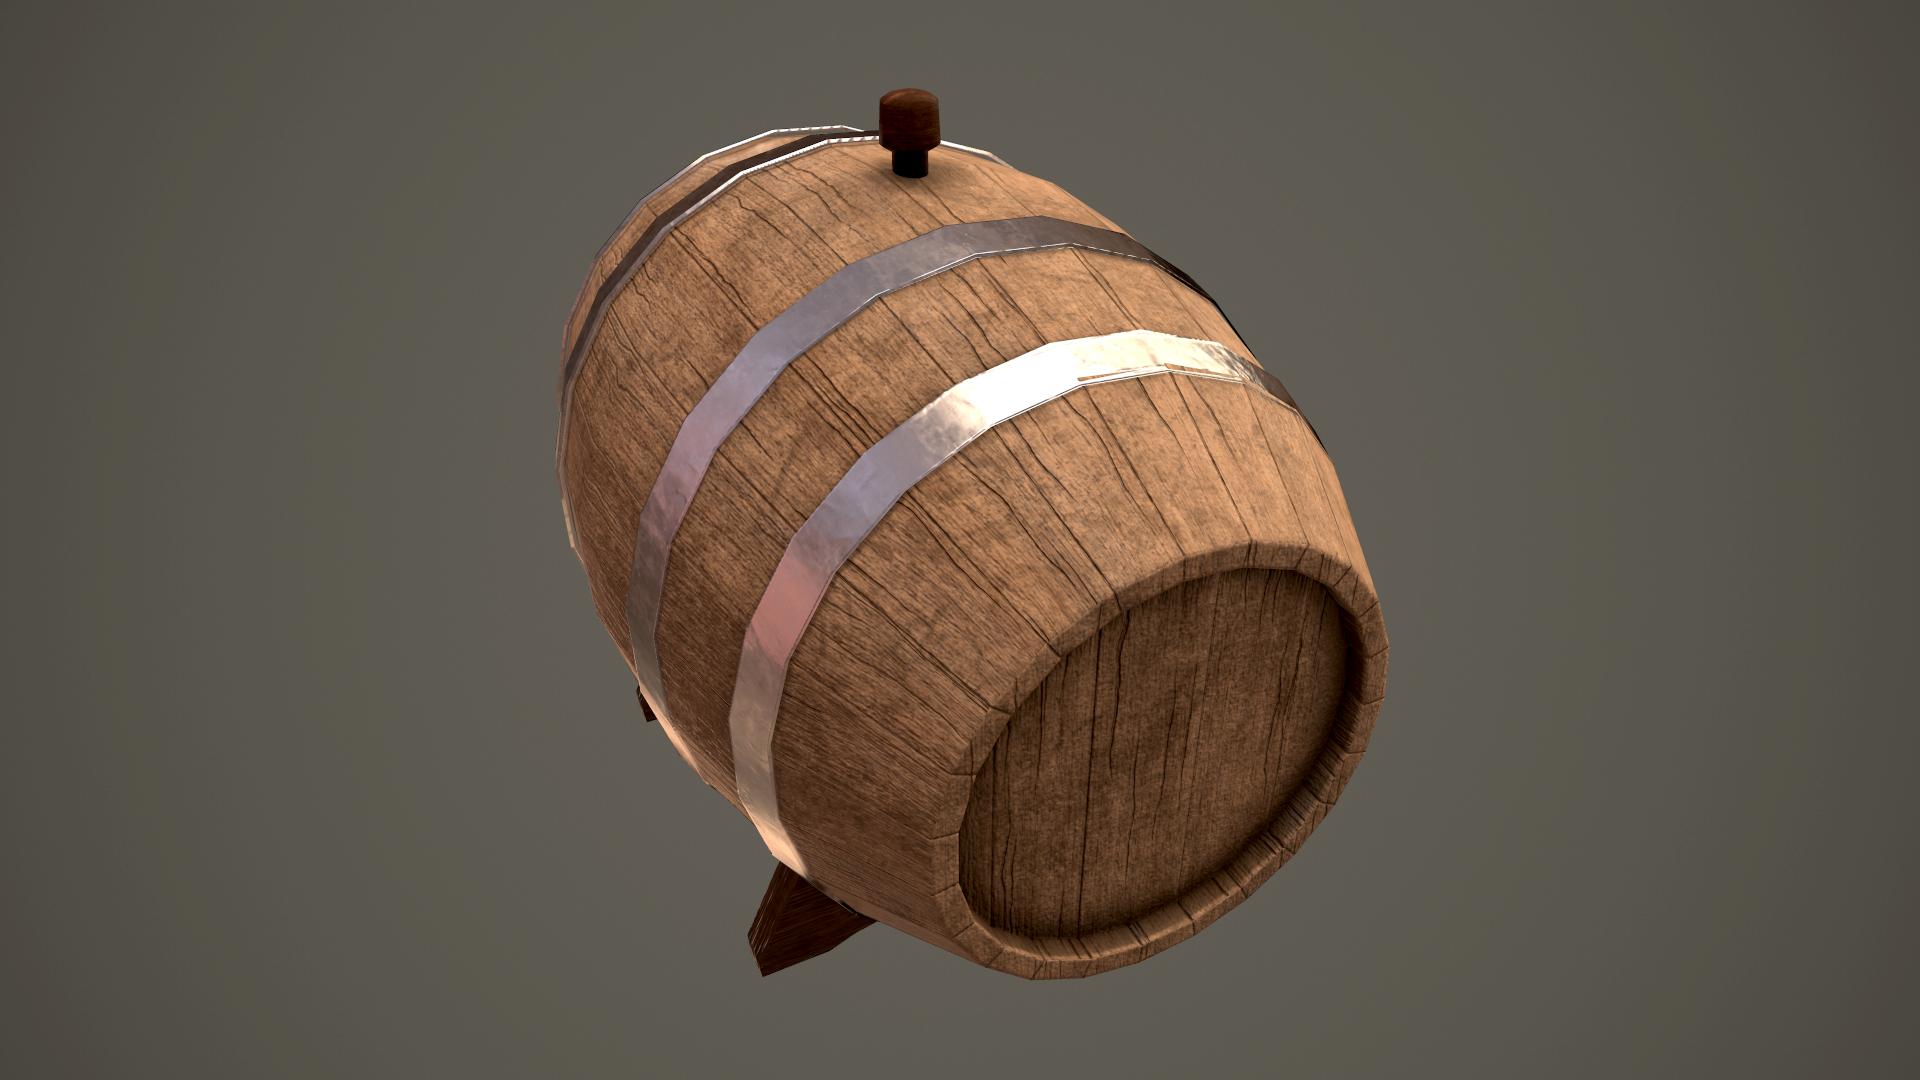 Wine Barrel Wine Barrel Barrel Wine